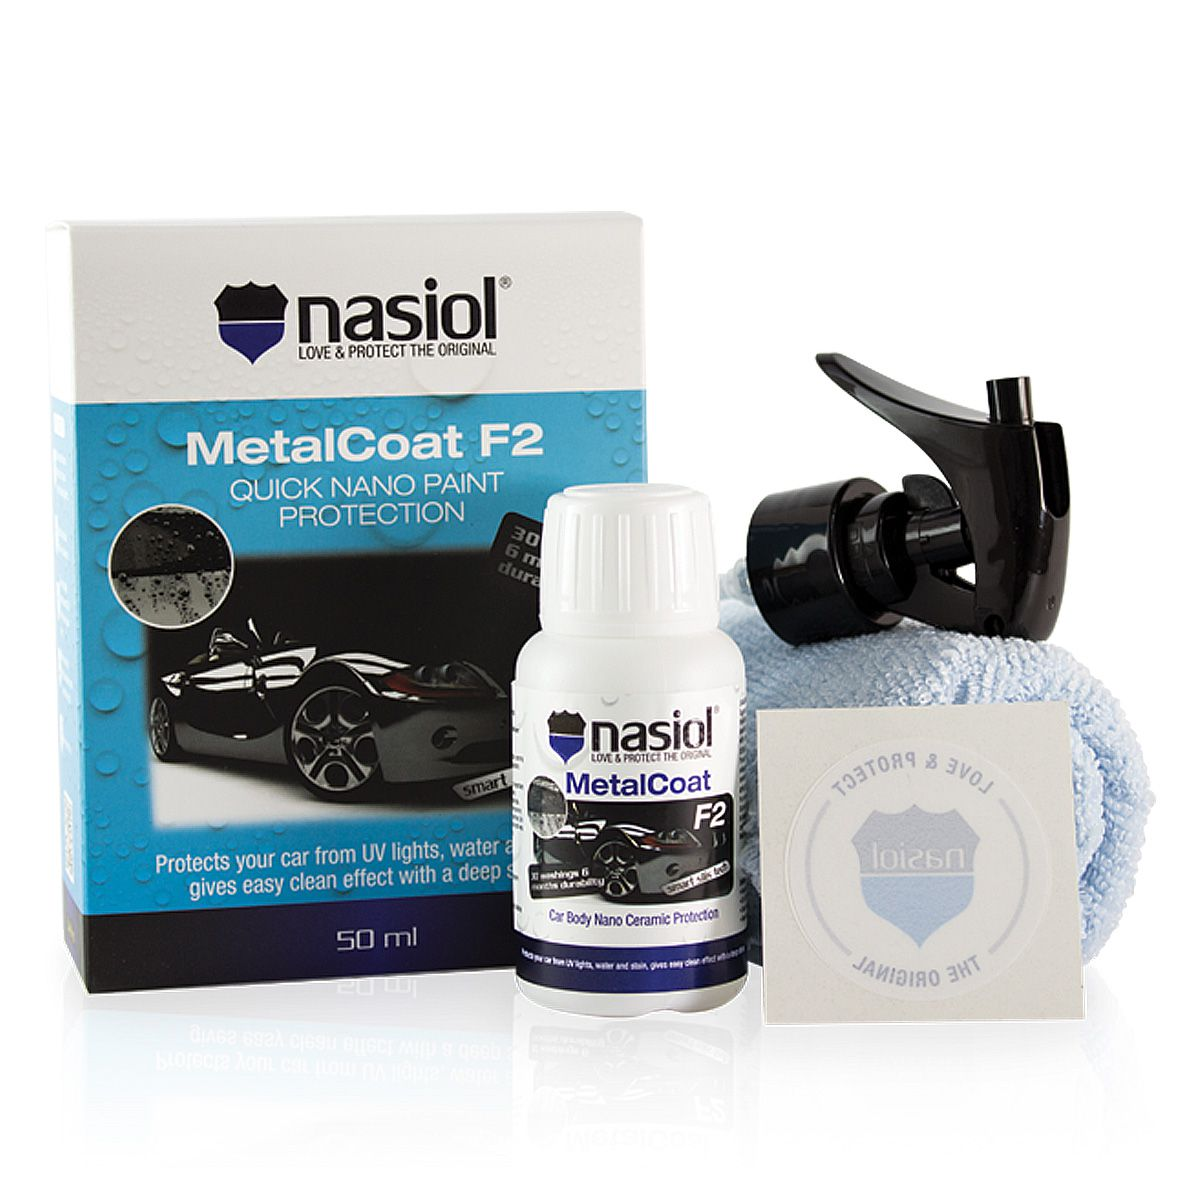 Protetor de Pintura, Plásticos e Metais Metalcoat  F2 50ml Nasiol